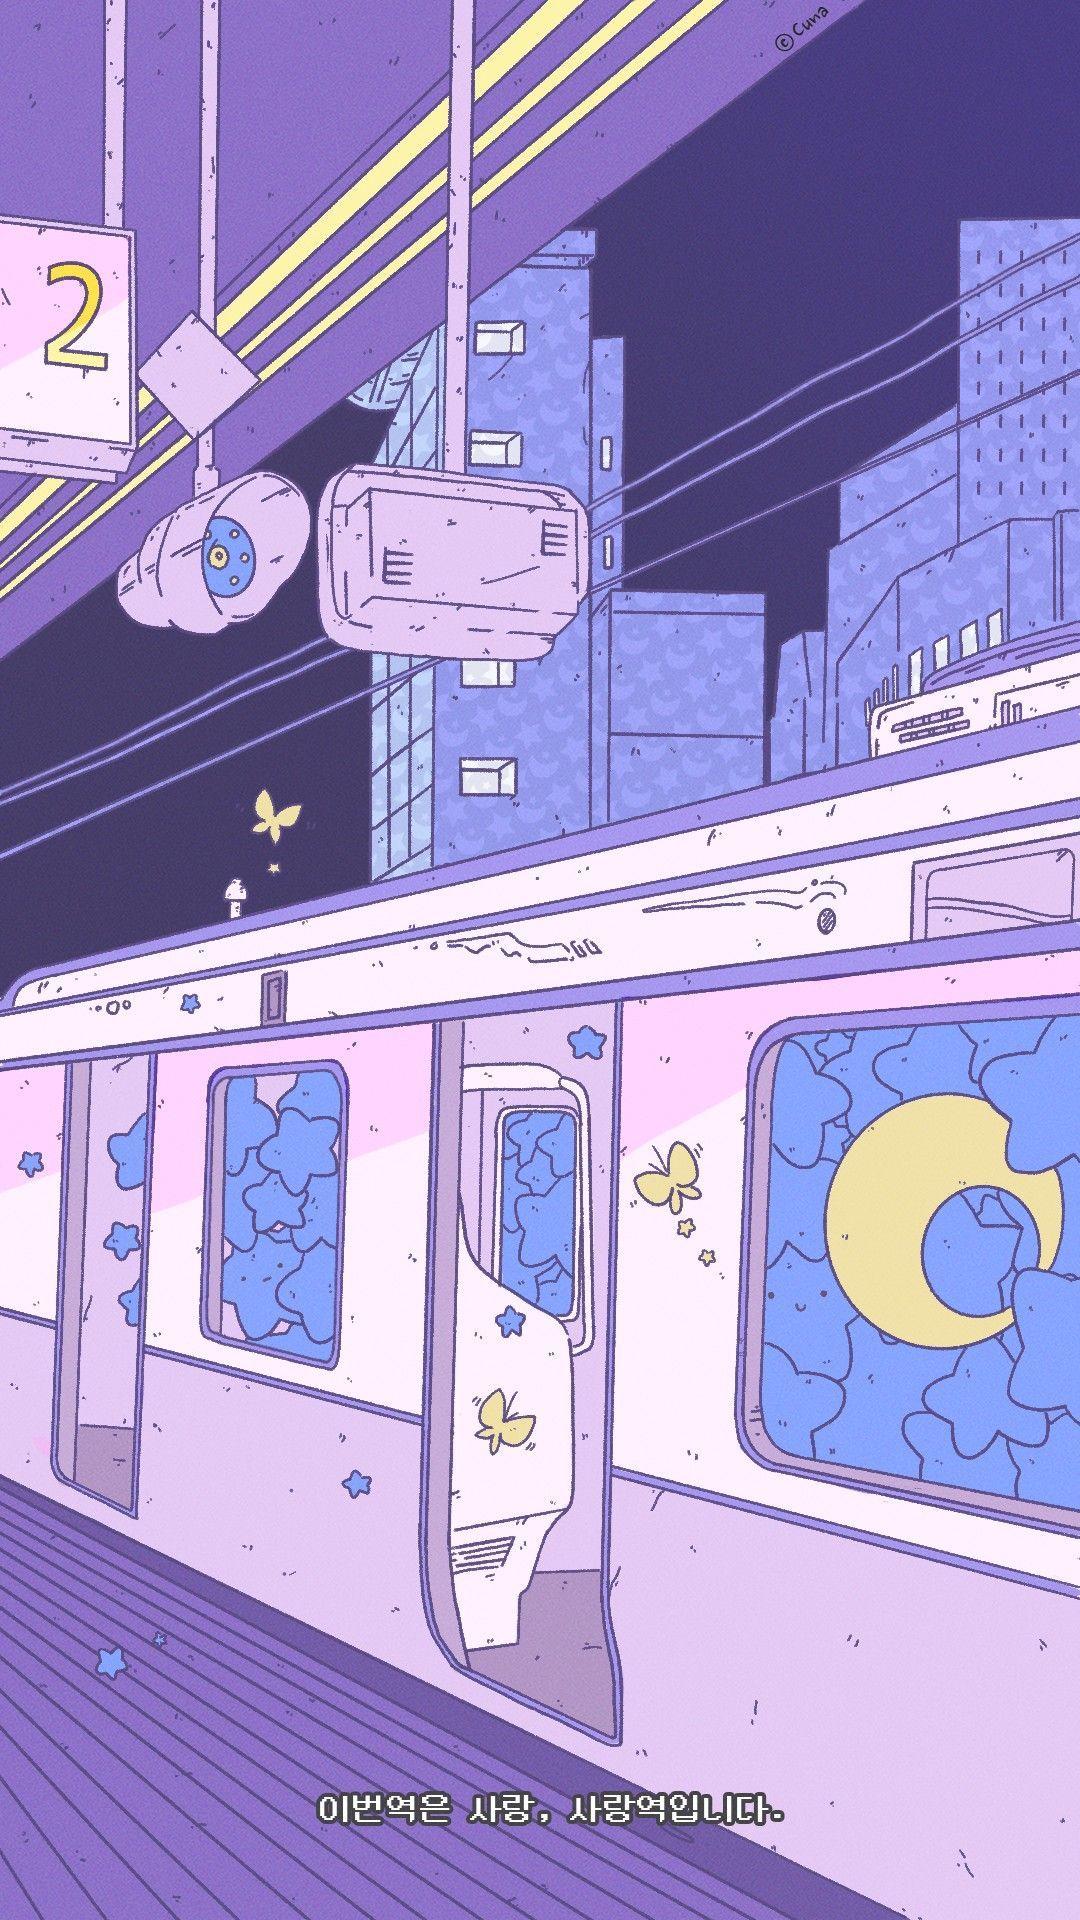 #the purple japanese train aesthetic | Aesthetic pastel wallpaper, Pas